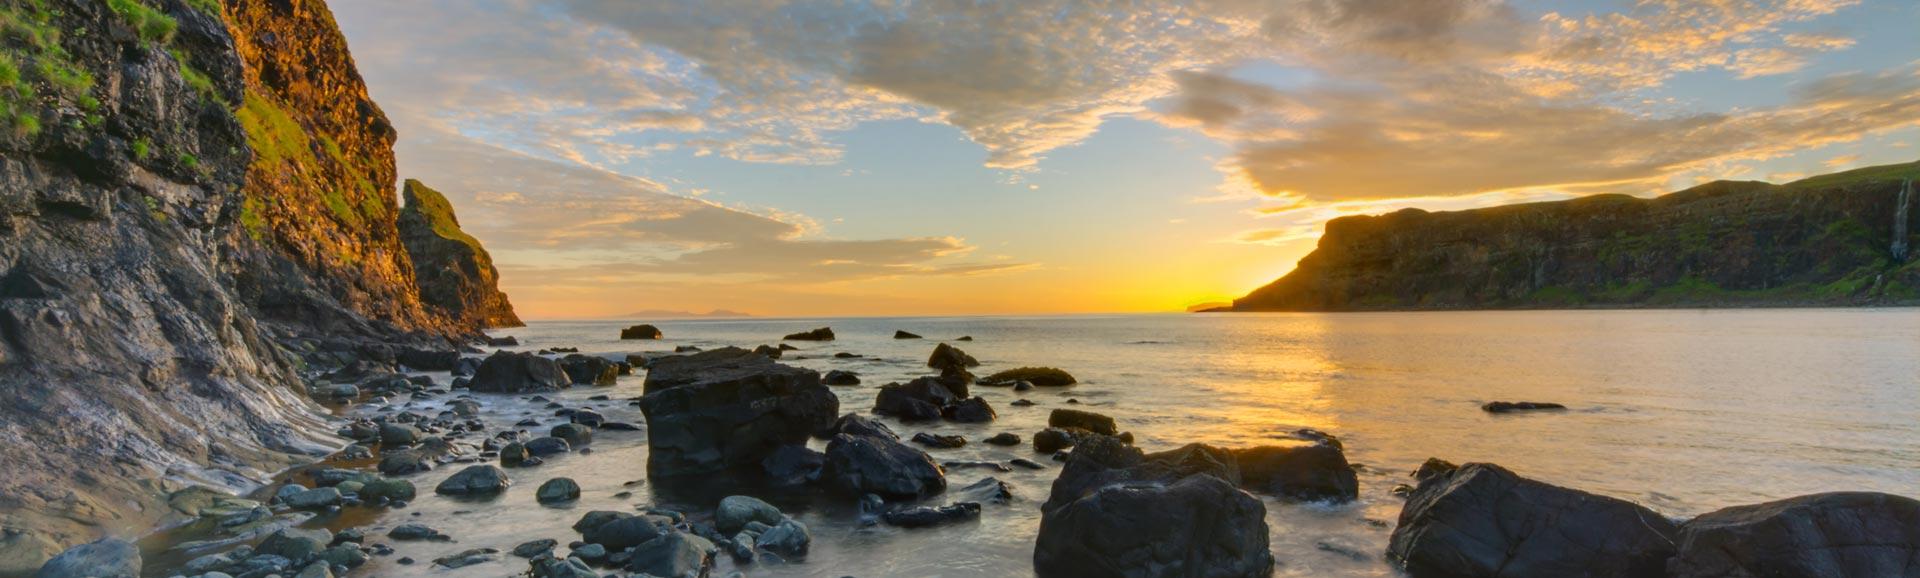 Sonnenuntergang in der Talisker Bucht, Schottland.